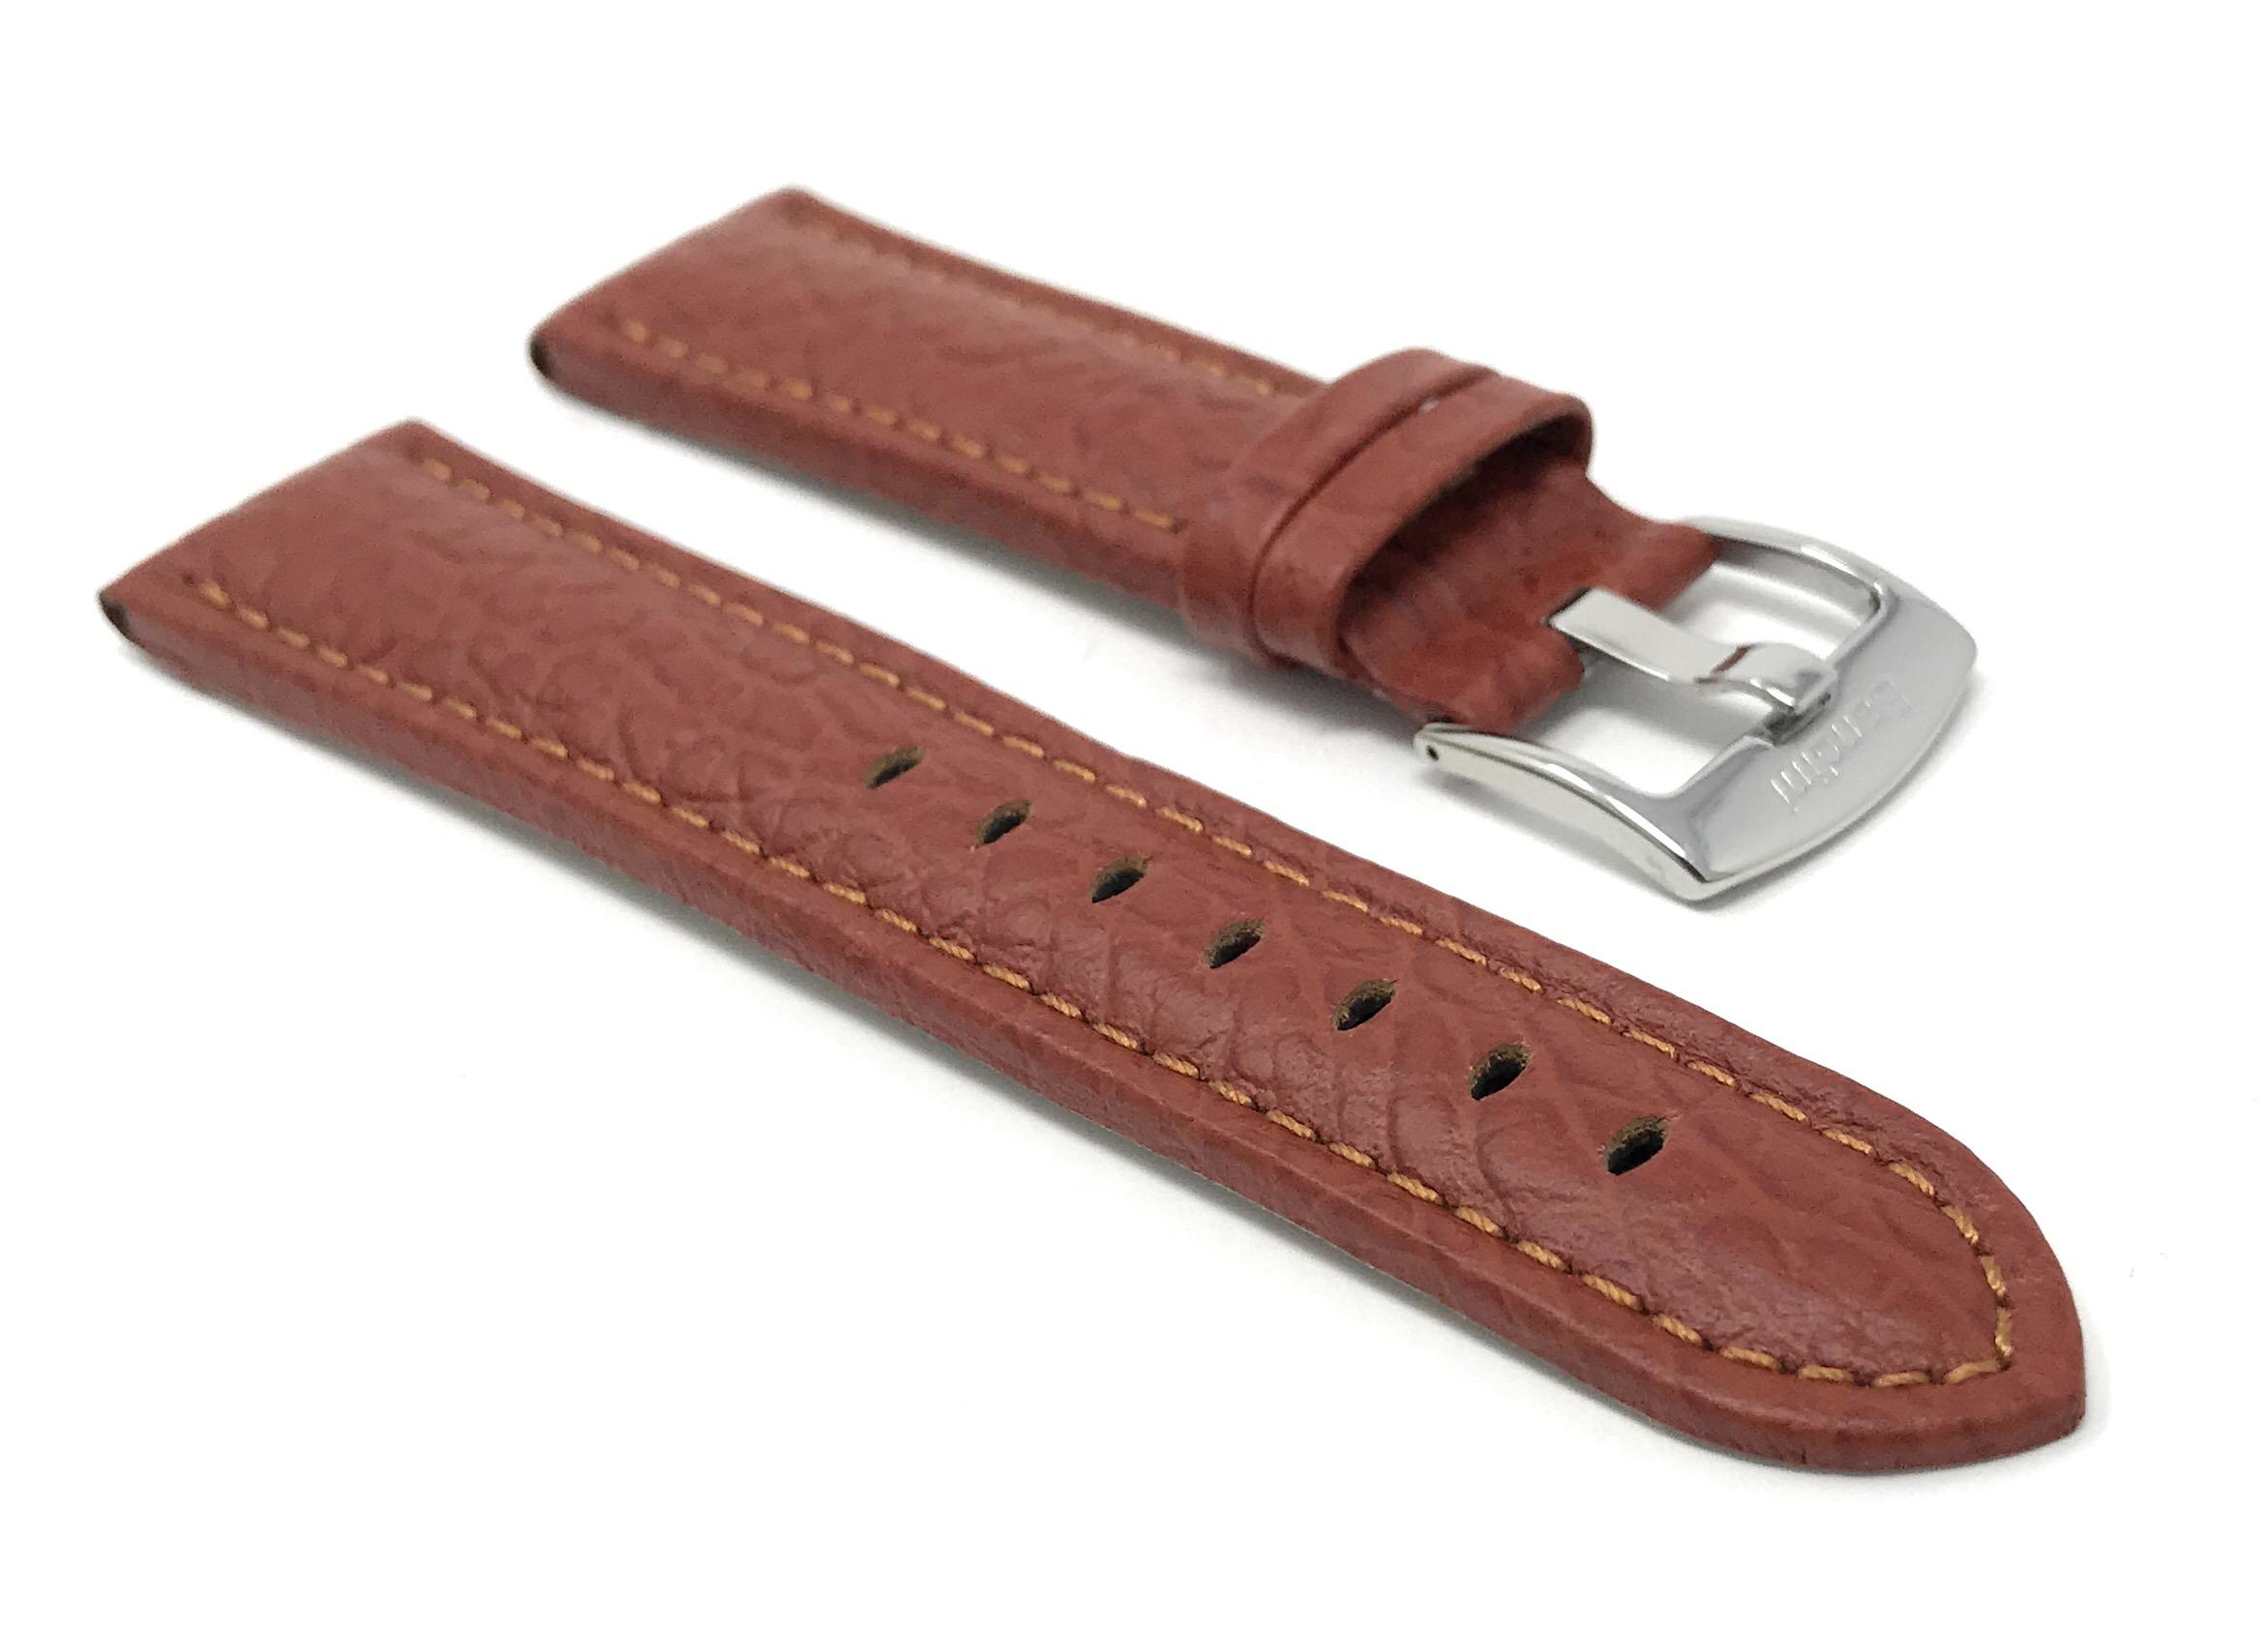 Bandini-Watch-Band-Leather-Strap-Buffalo-Pattern-18mm-30mm-Extra-Long-Also thumbnail 15